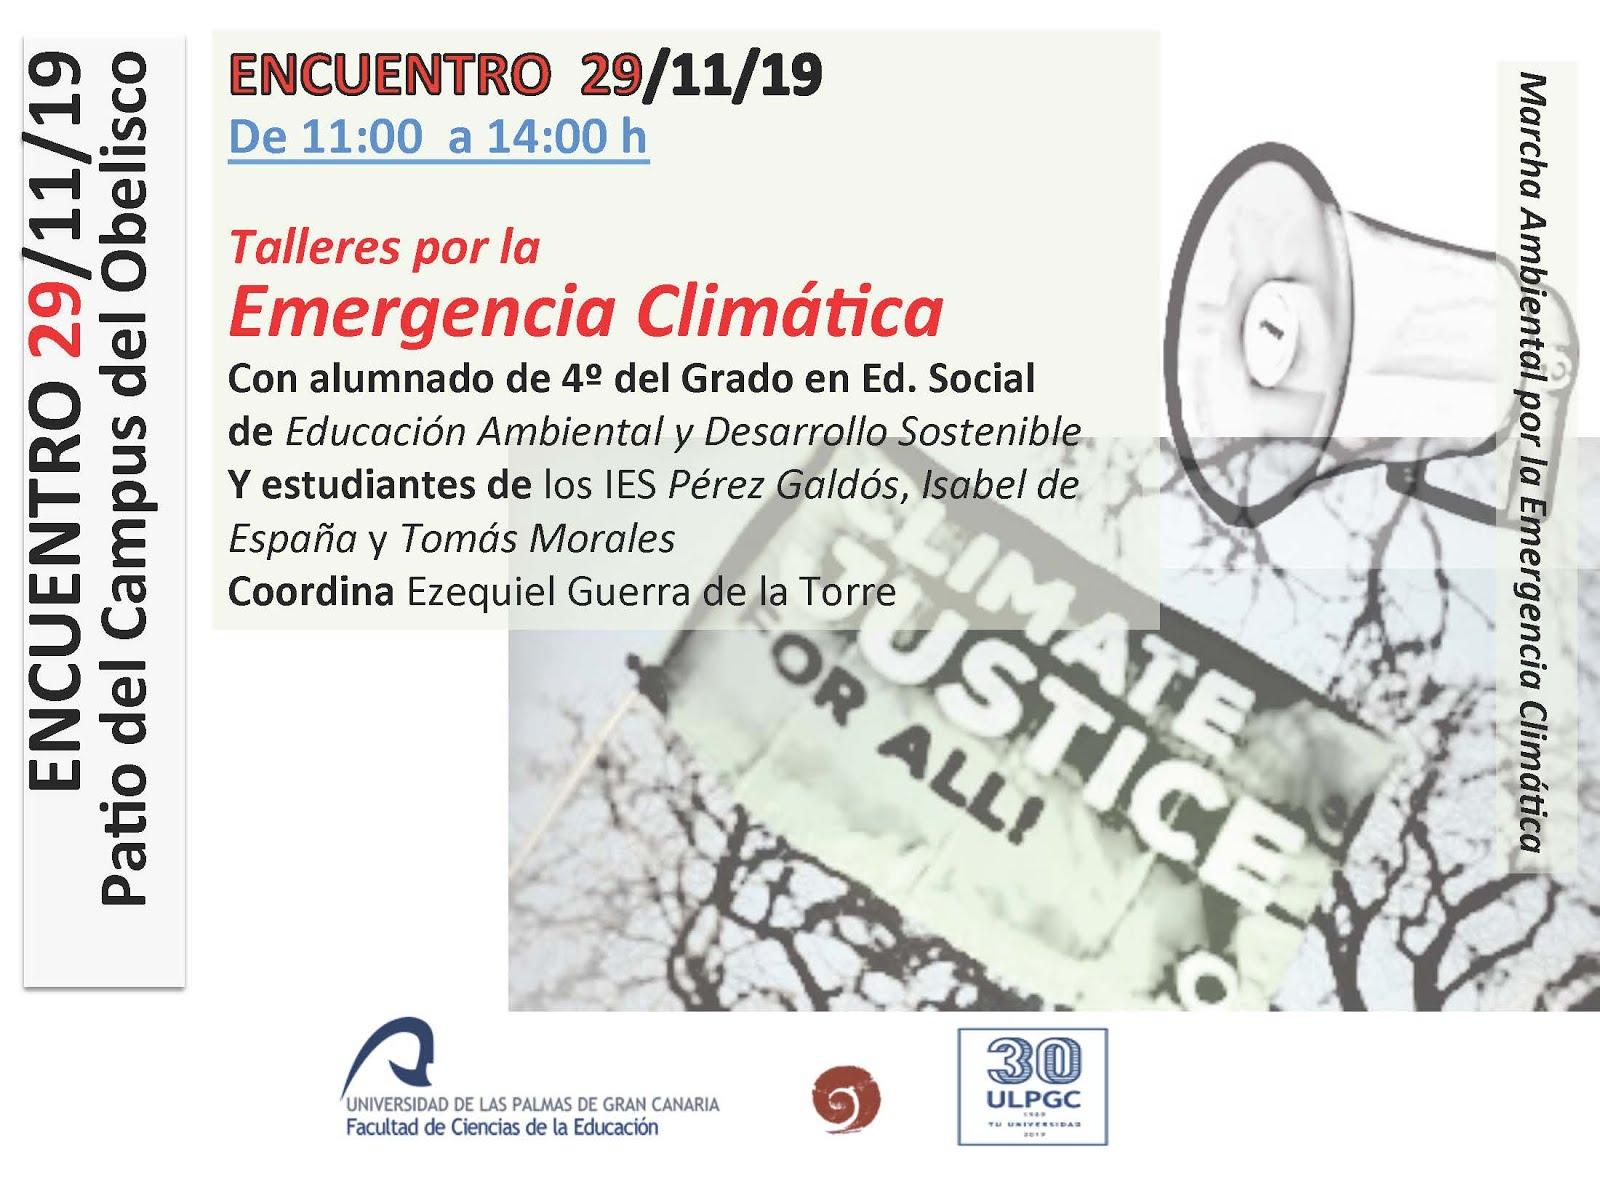 Encuentro emergencia climática (29/11/19)